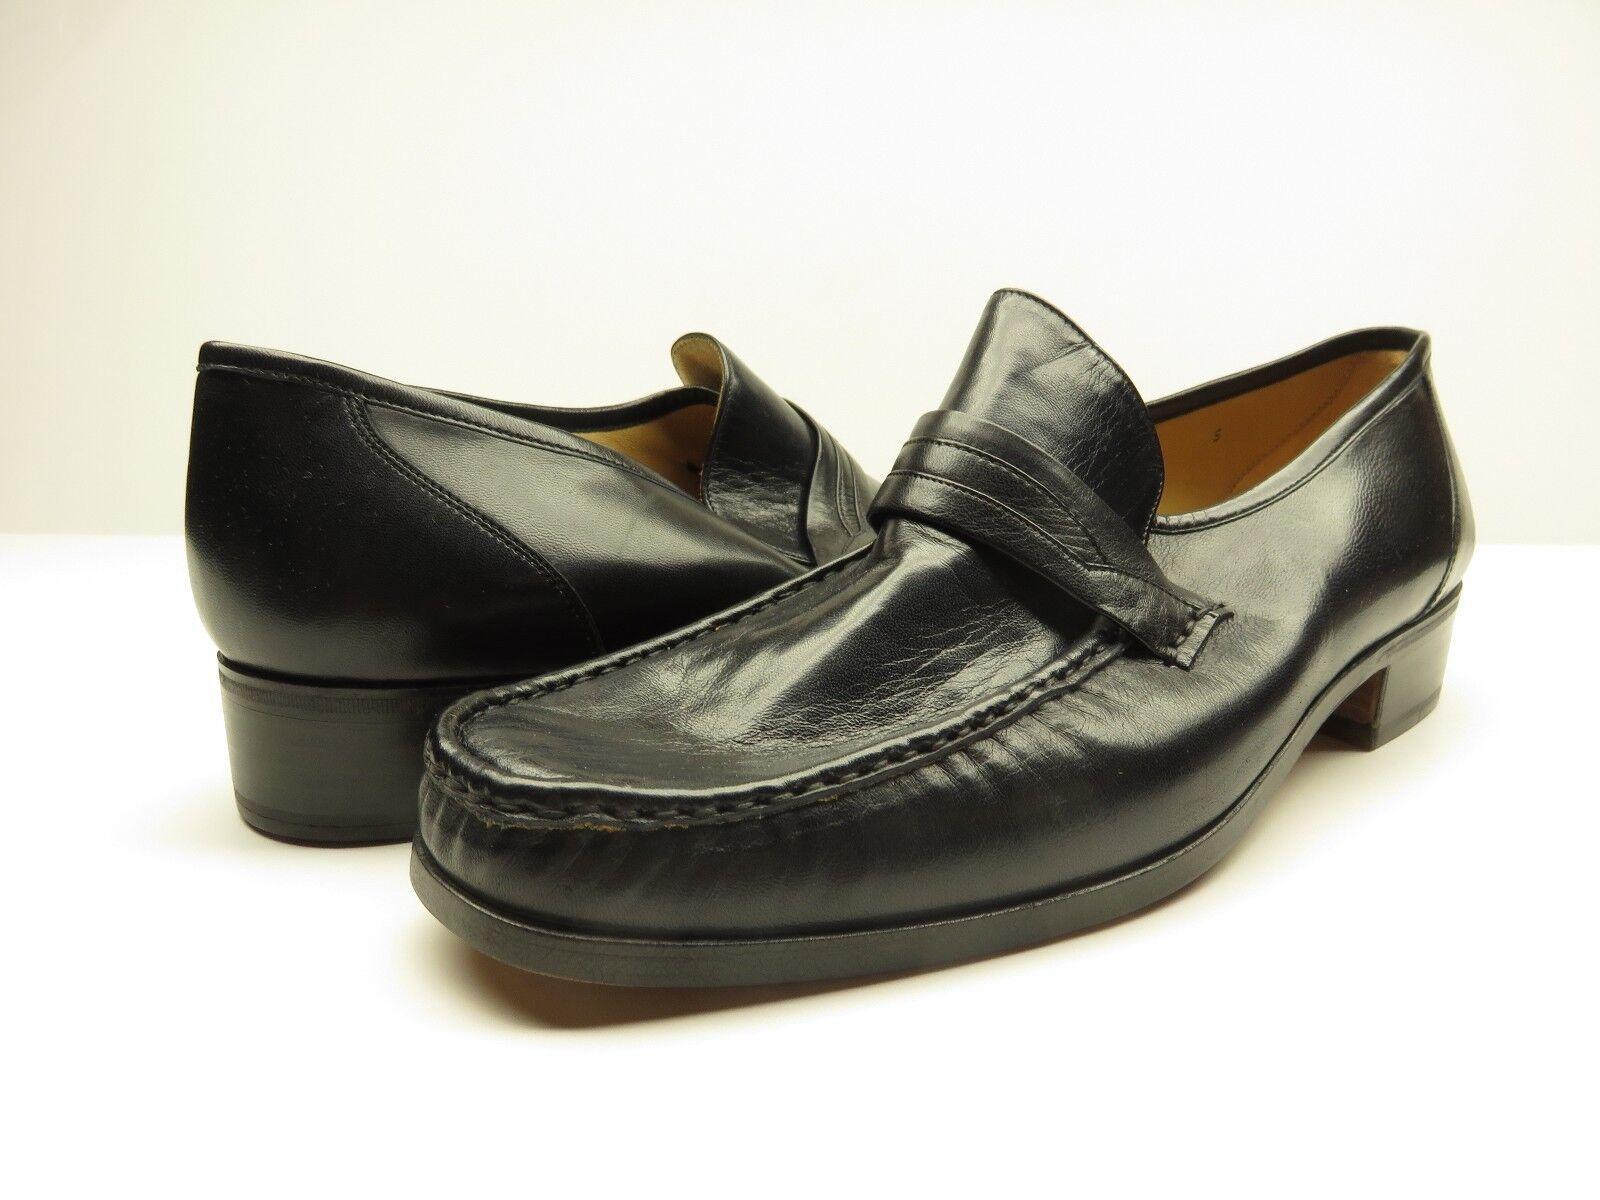 online al miglior prezzo NEW Andre Marseille Hanover Slip-on Loafer Dress scarpe NAPPA NAVY NAVY NAVY Dimensione 9.5 M NOS  perfezionare